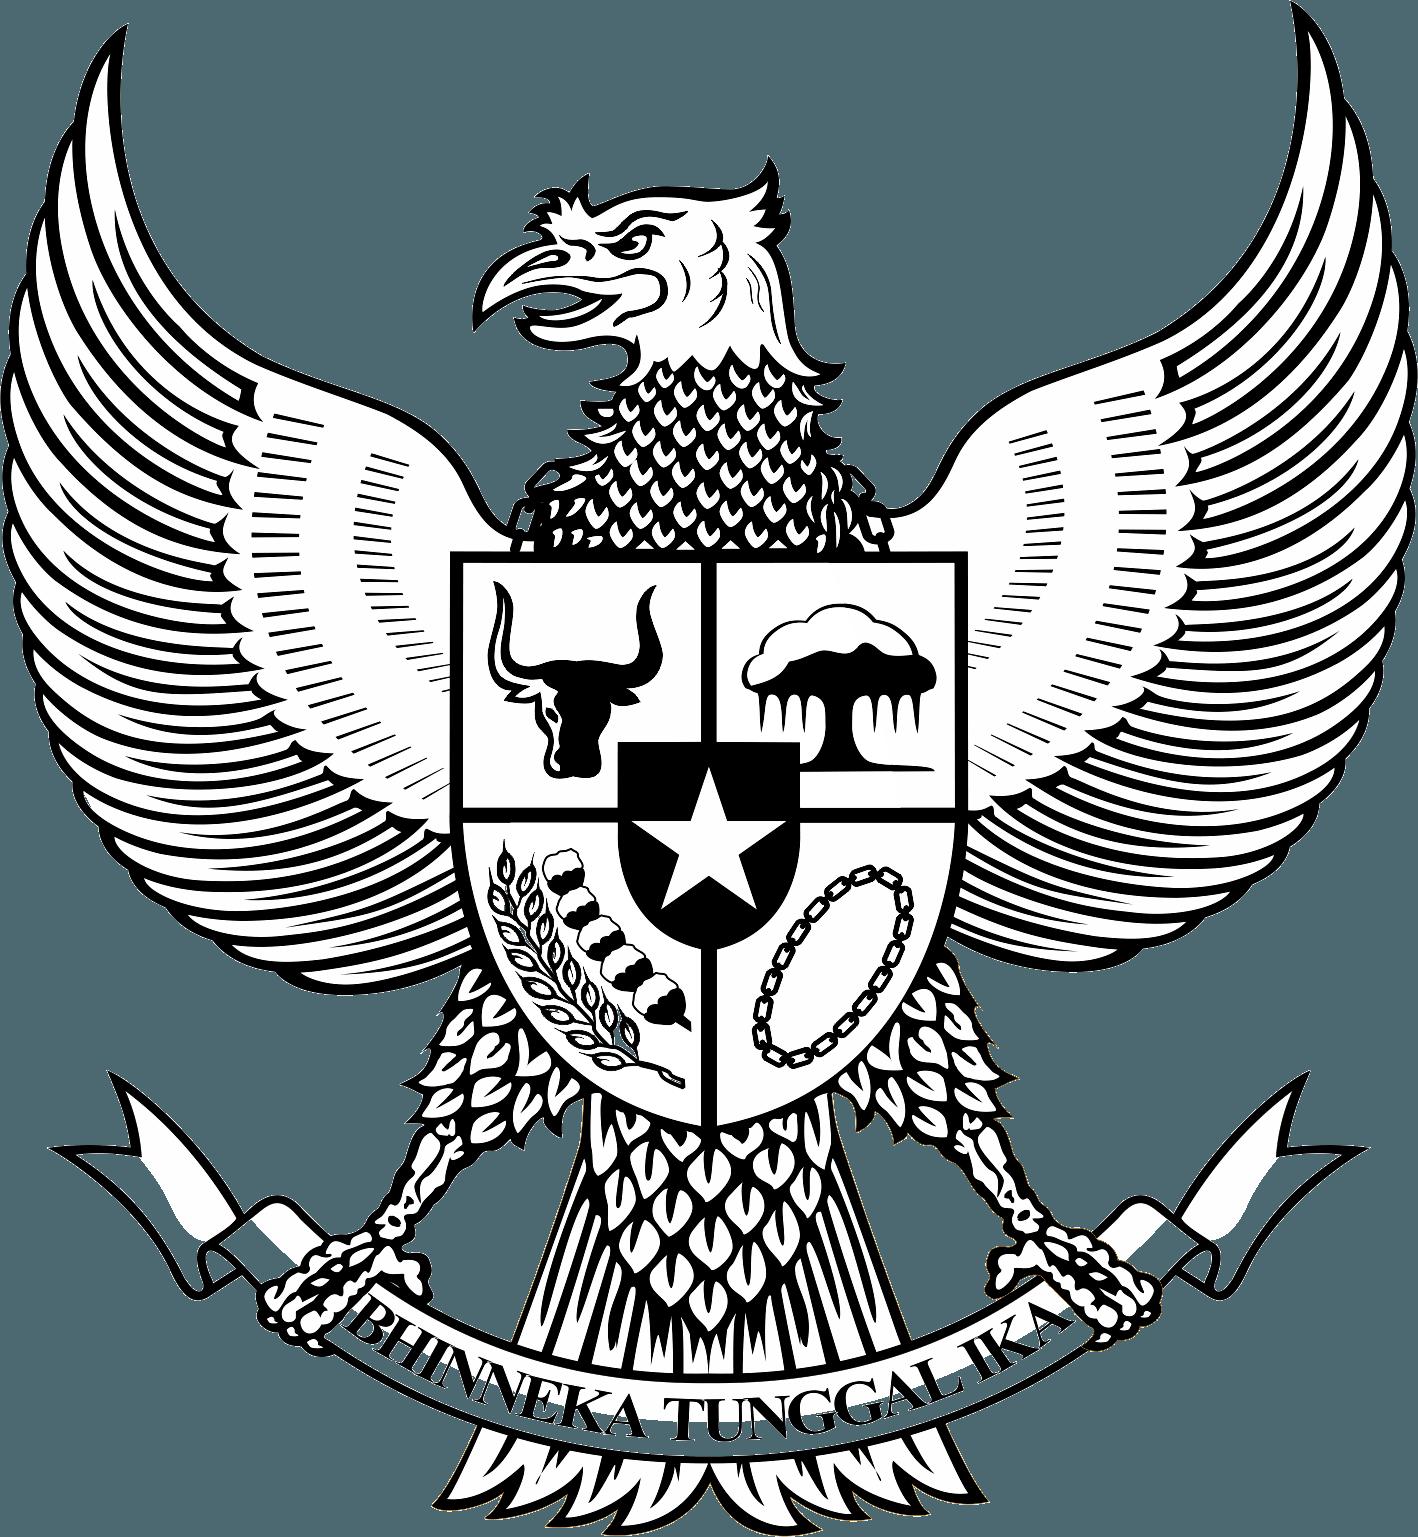 Logo Keren Png 256x256